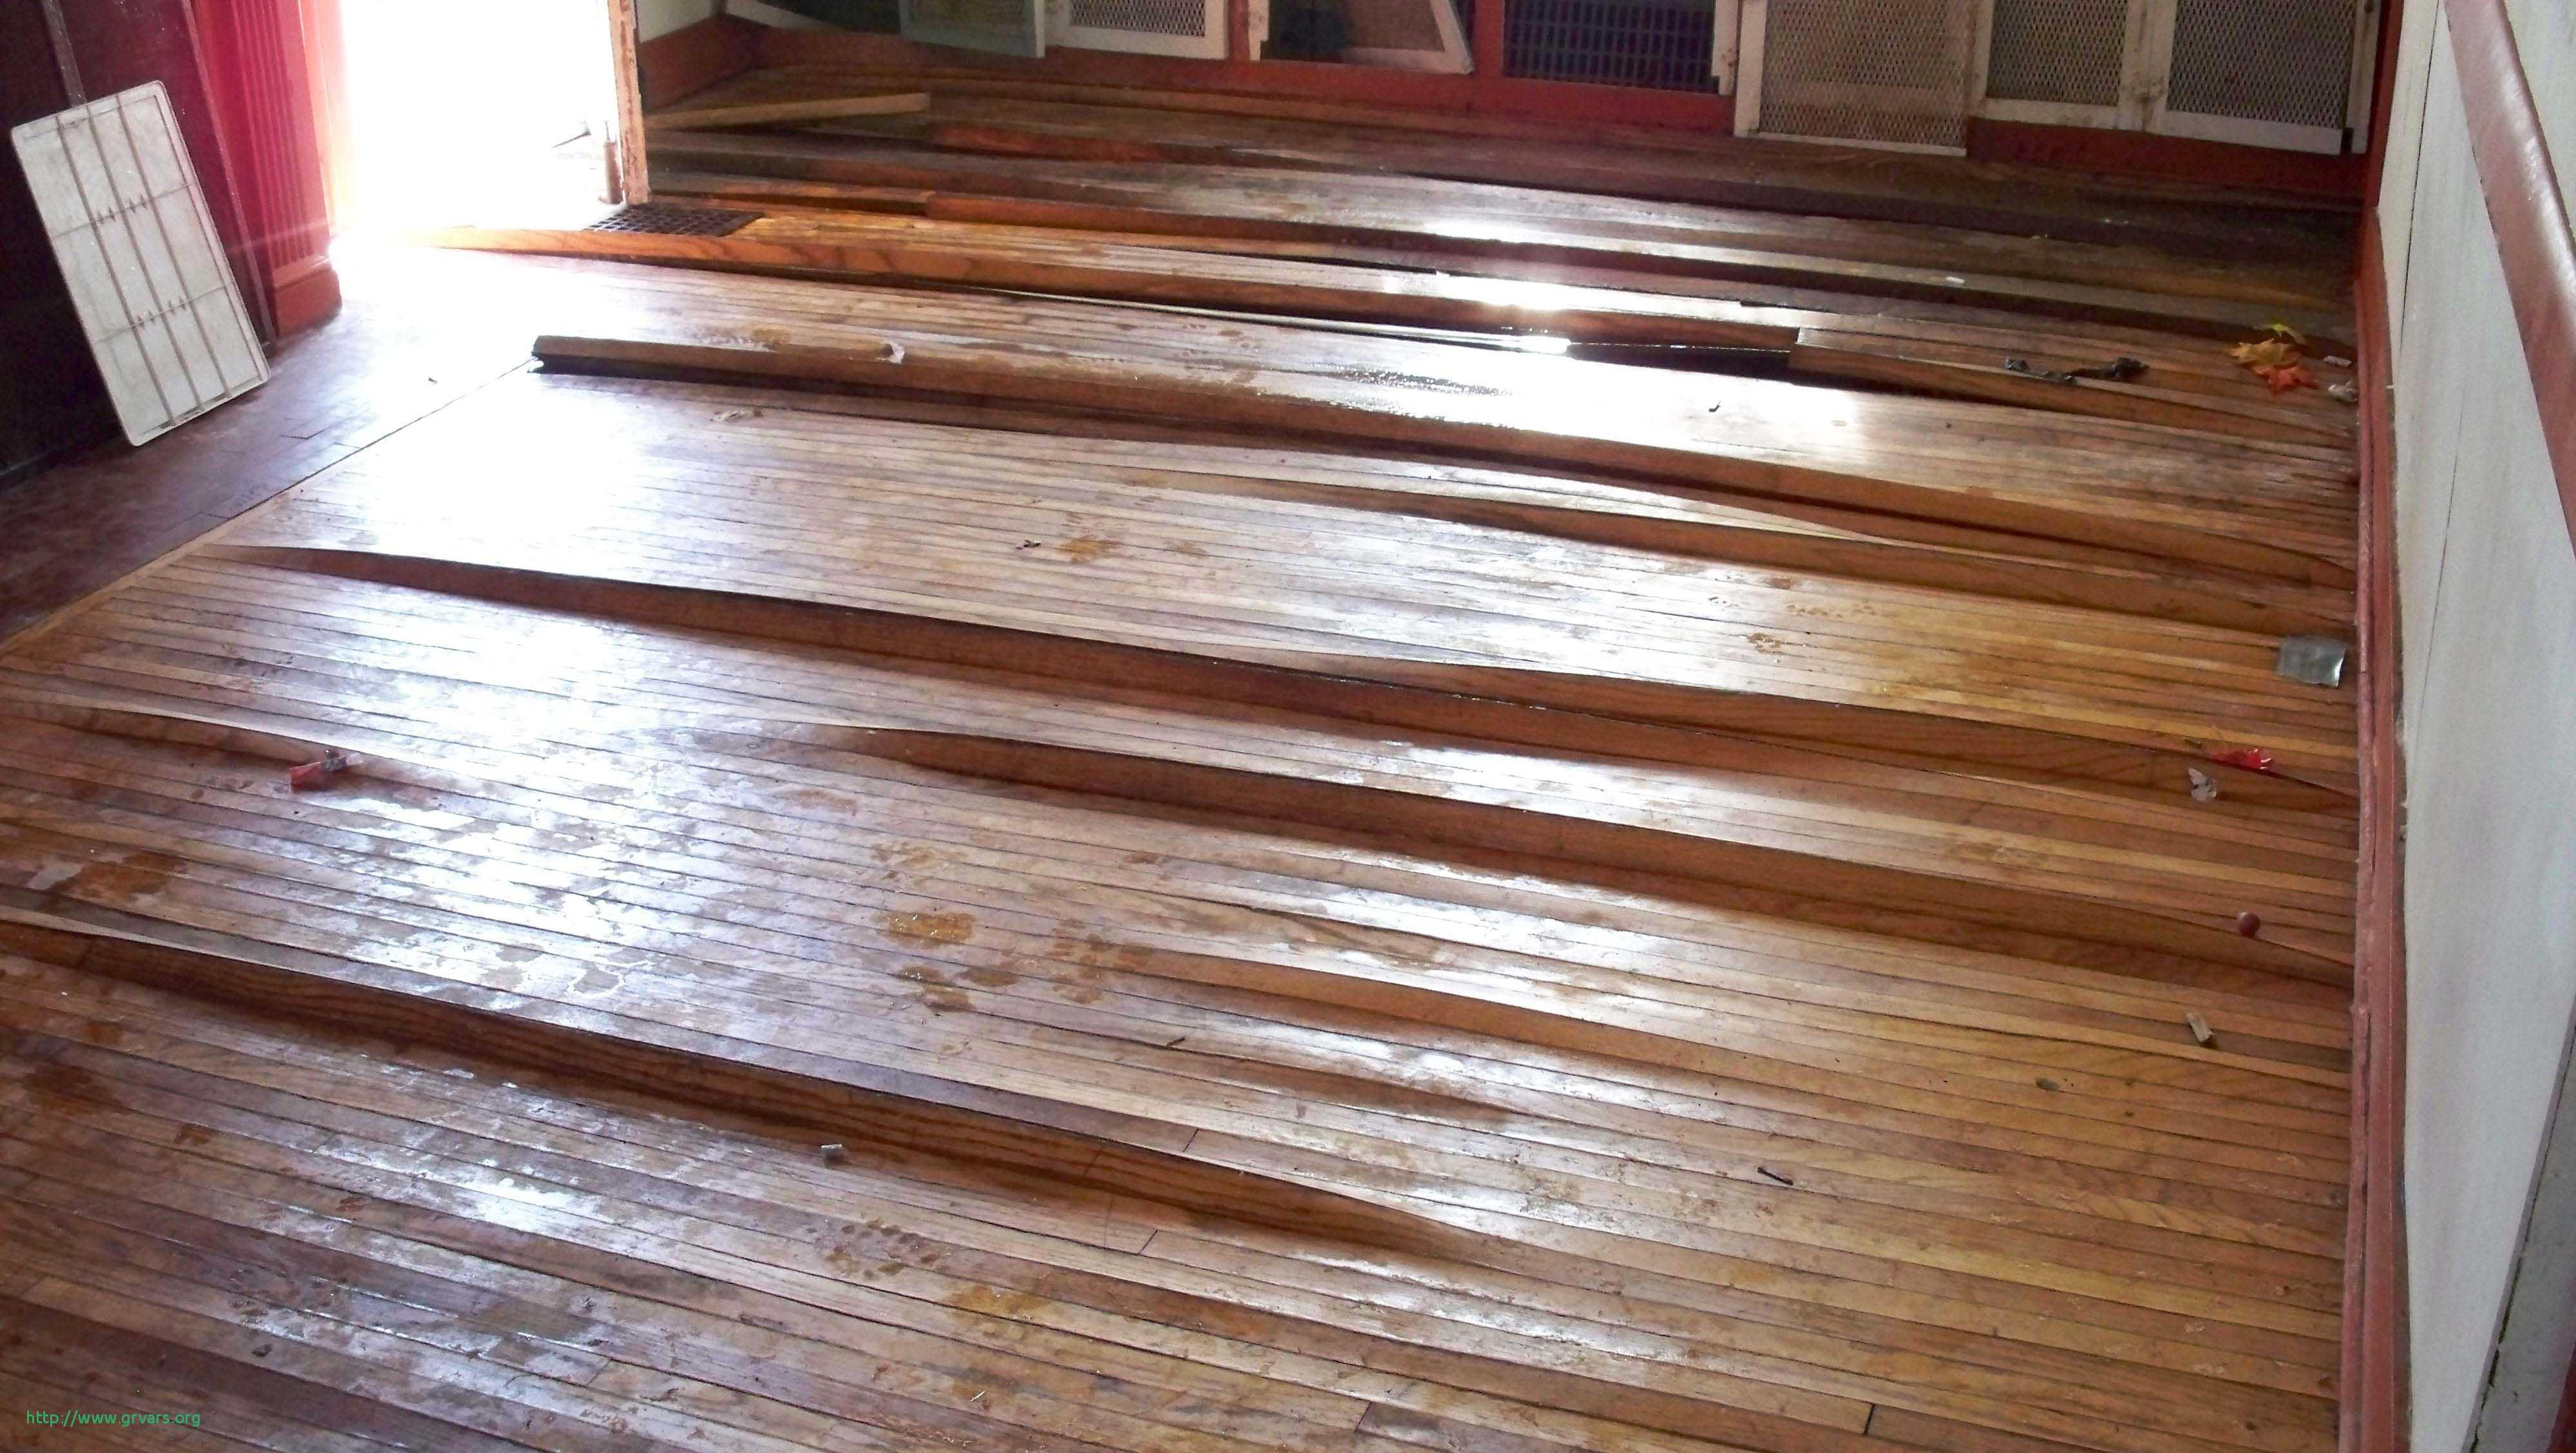 16 Famous Bona Hardwood Floor Cleaner 32 Oz 2021 free download bona hardwood floor cleaner 32 oz of 23 frais how much is a hardwood floor ideas blog with hardwood floor water damage warping